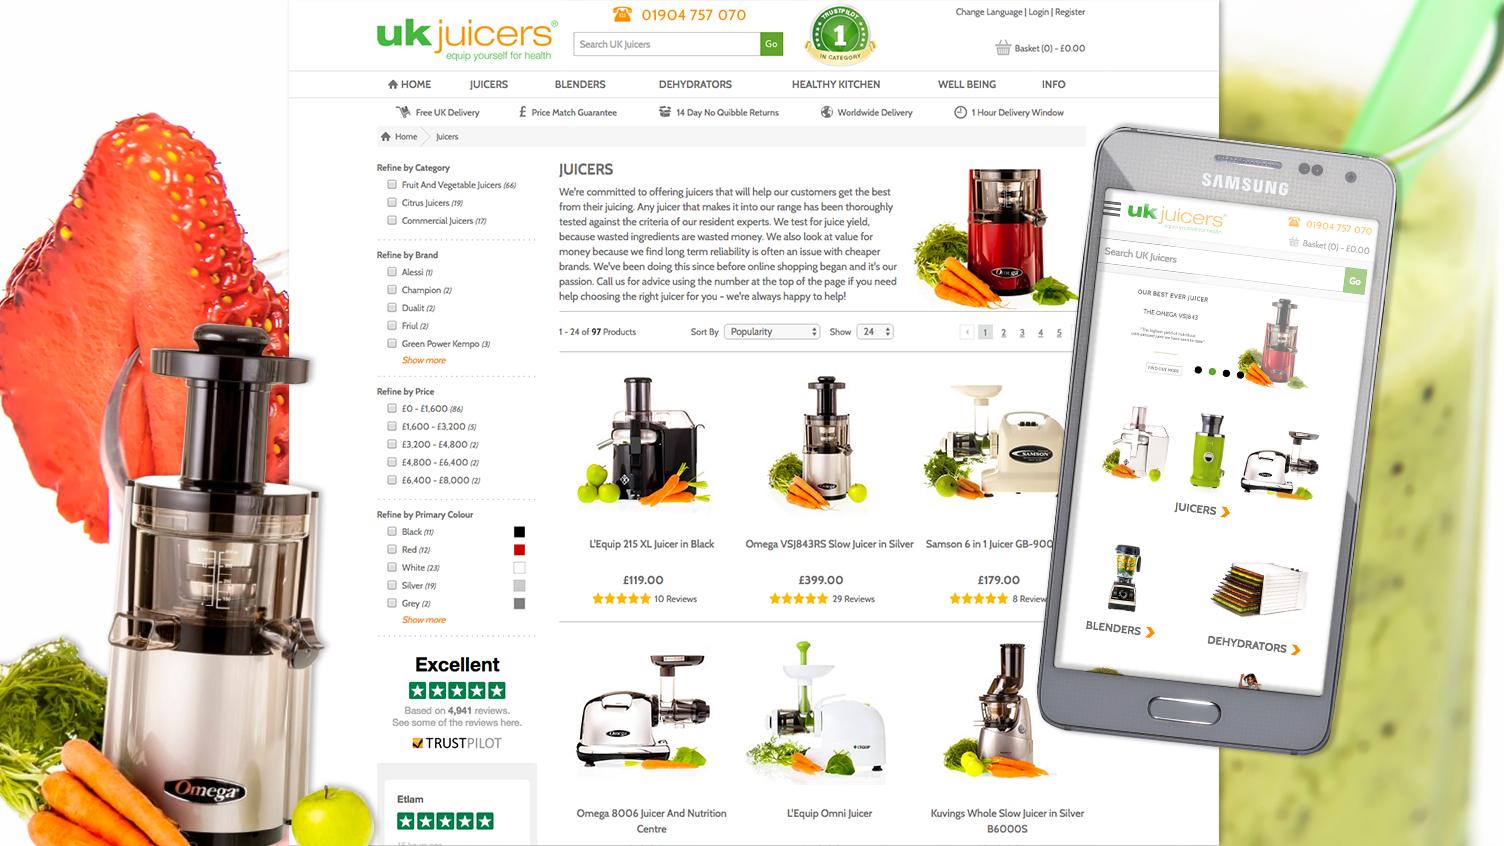 UK Juicers